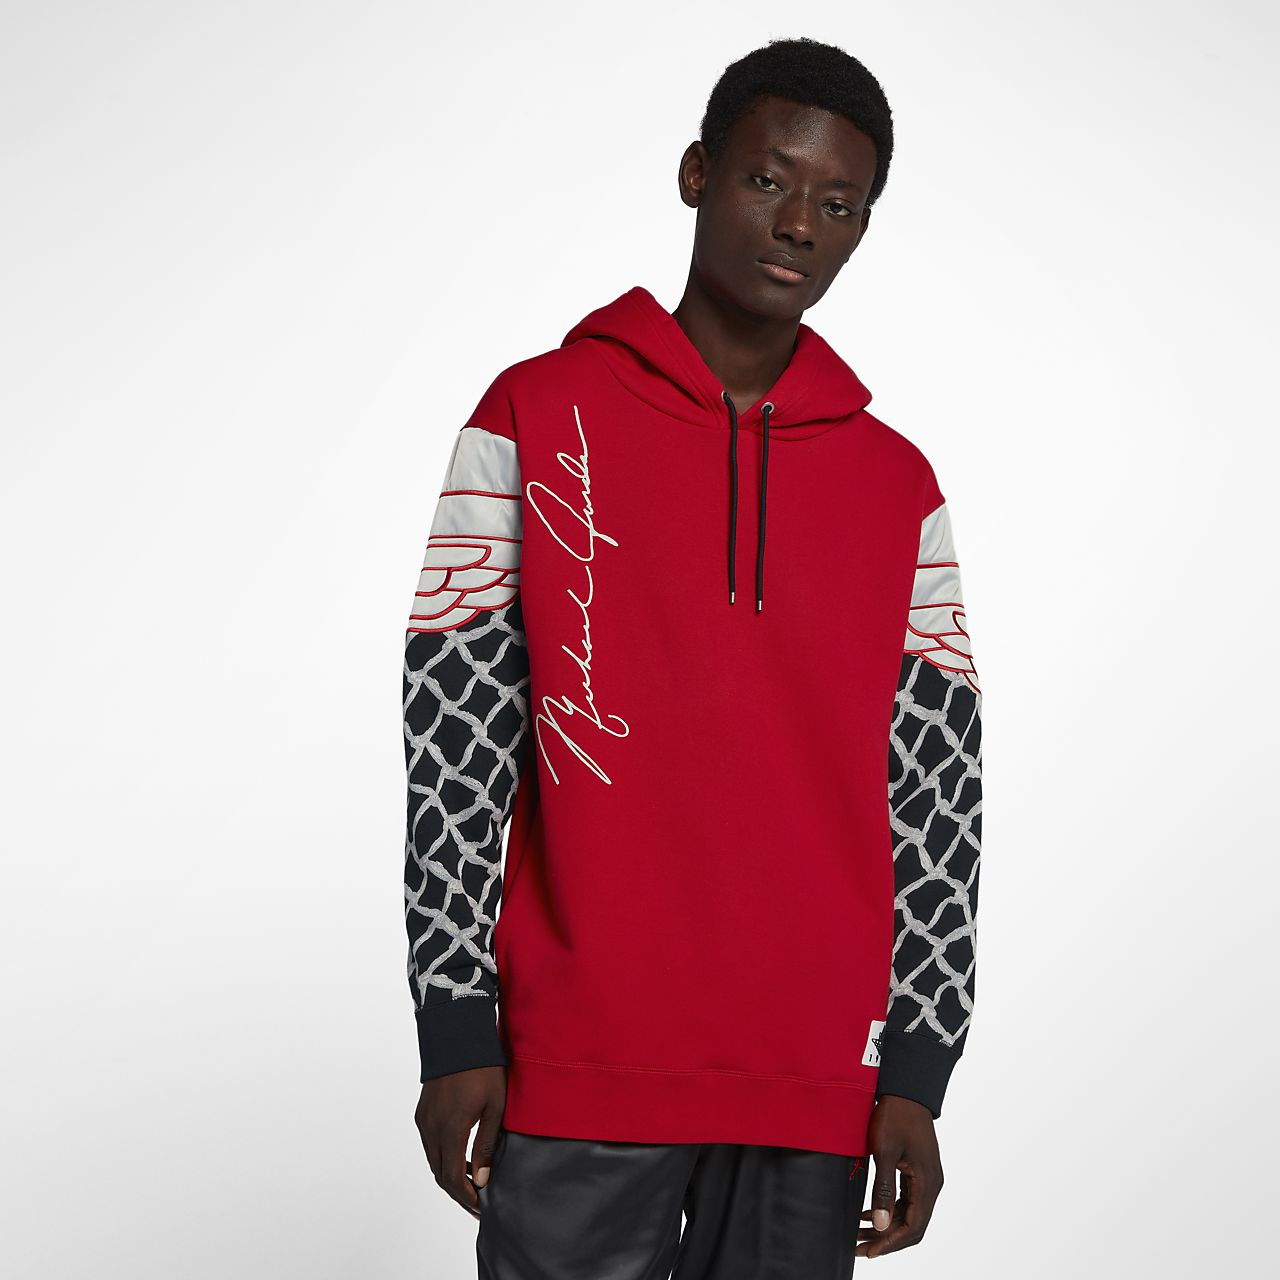 5ff944a31d94 Jordan Sportswear Pinnacle Men s Pullover Hoodie. Nike.com CA